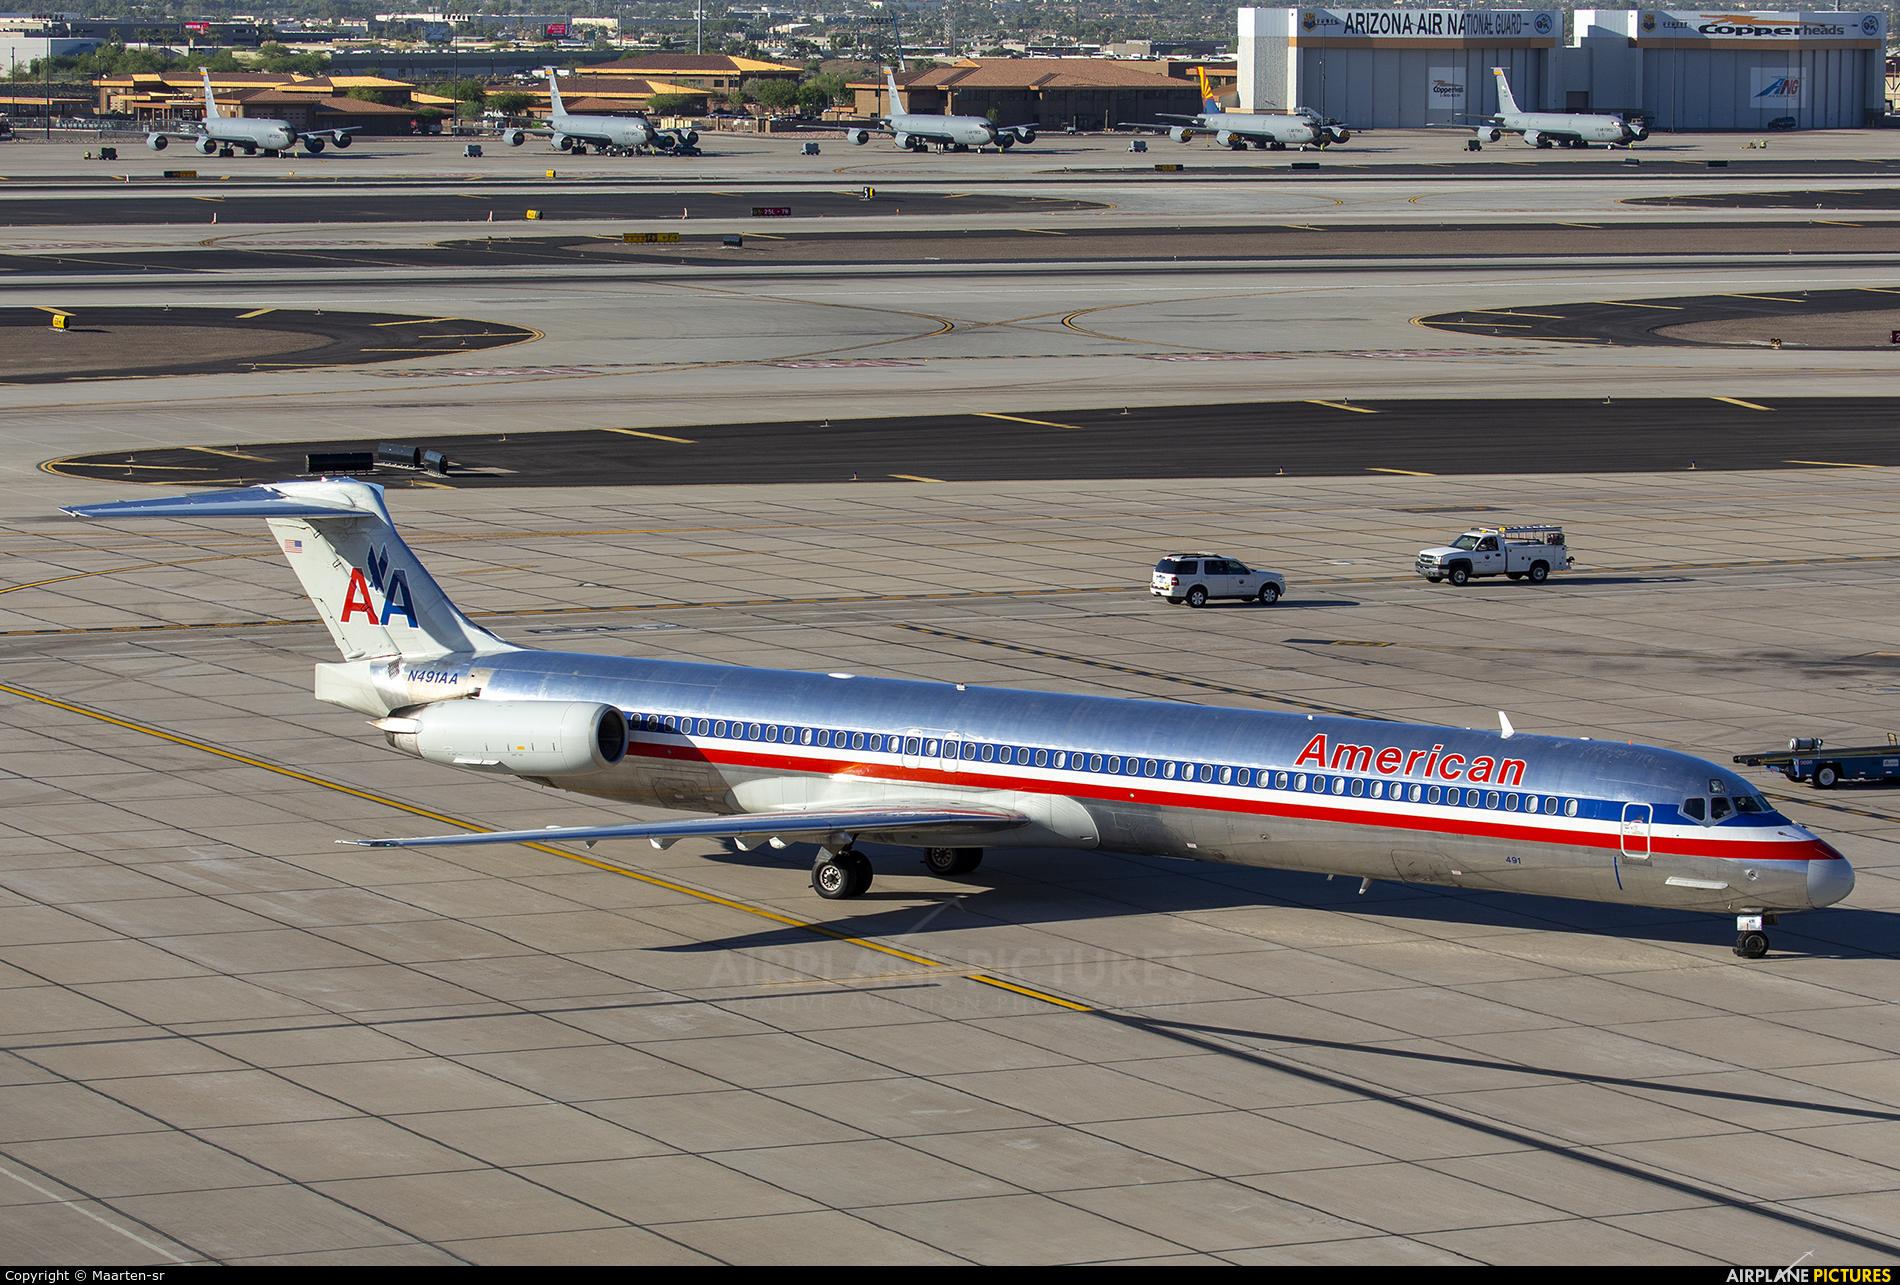 American Airlines N491AA aircraft at Phoenix - Sky Harbor Intl